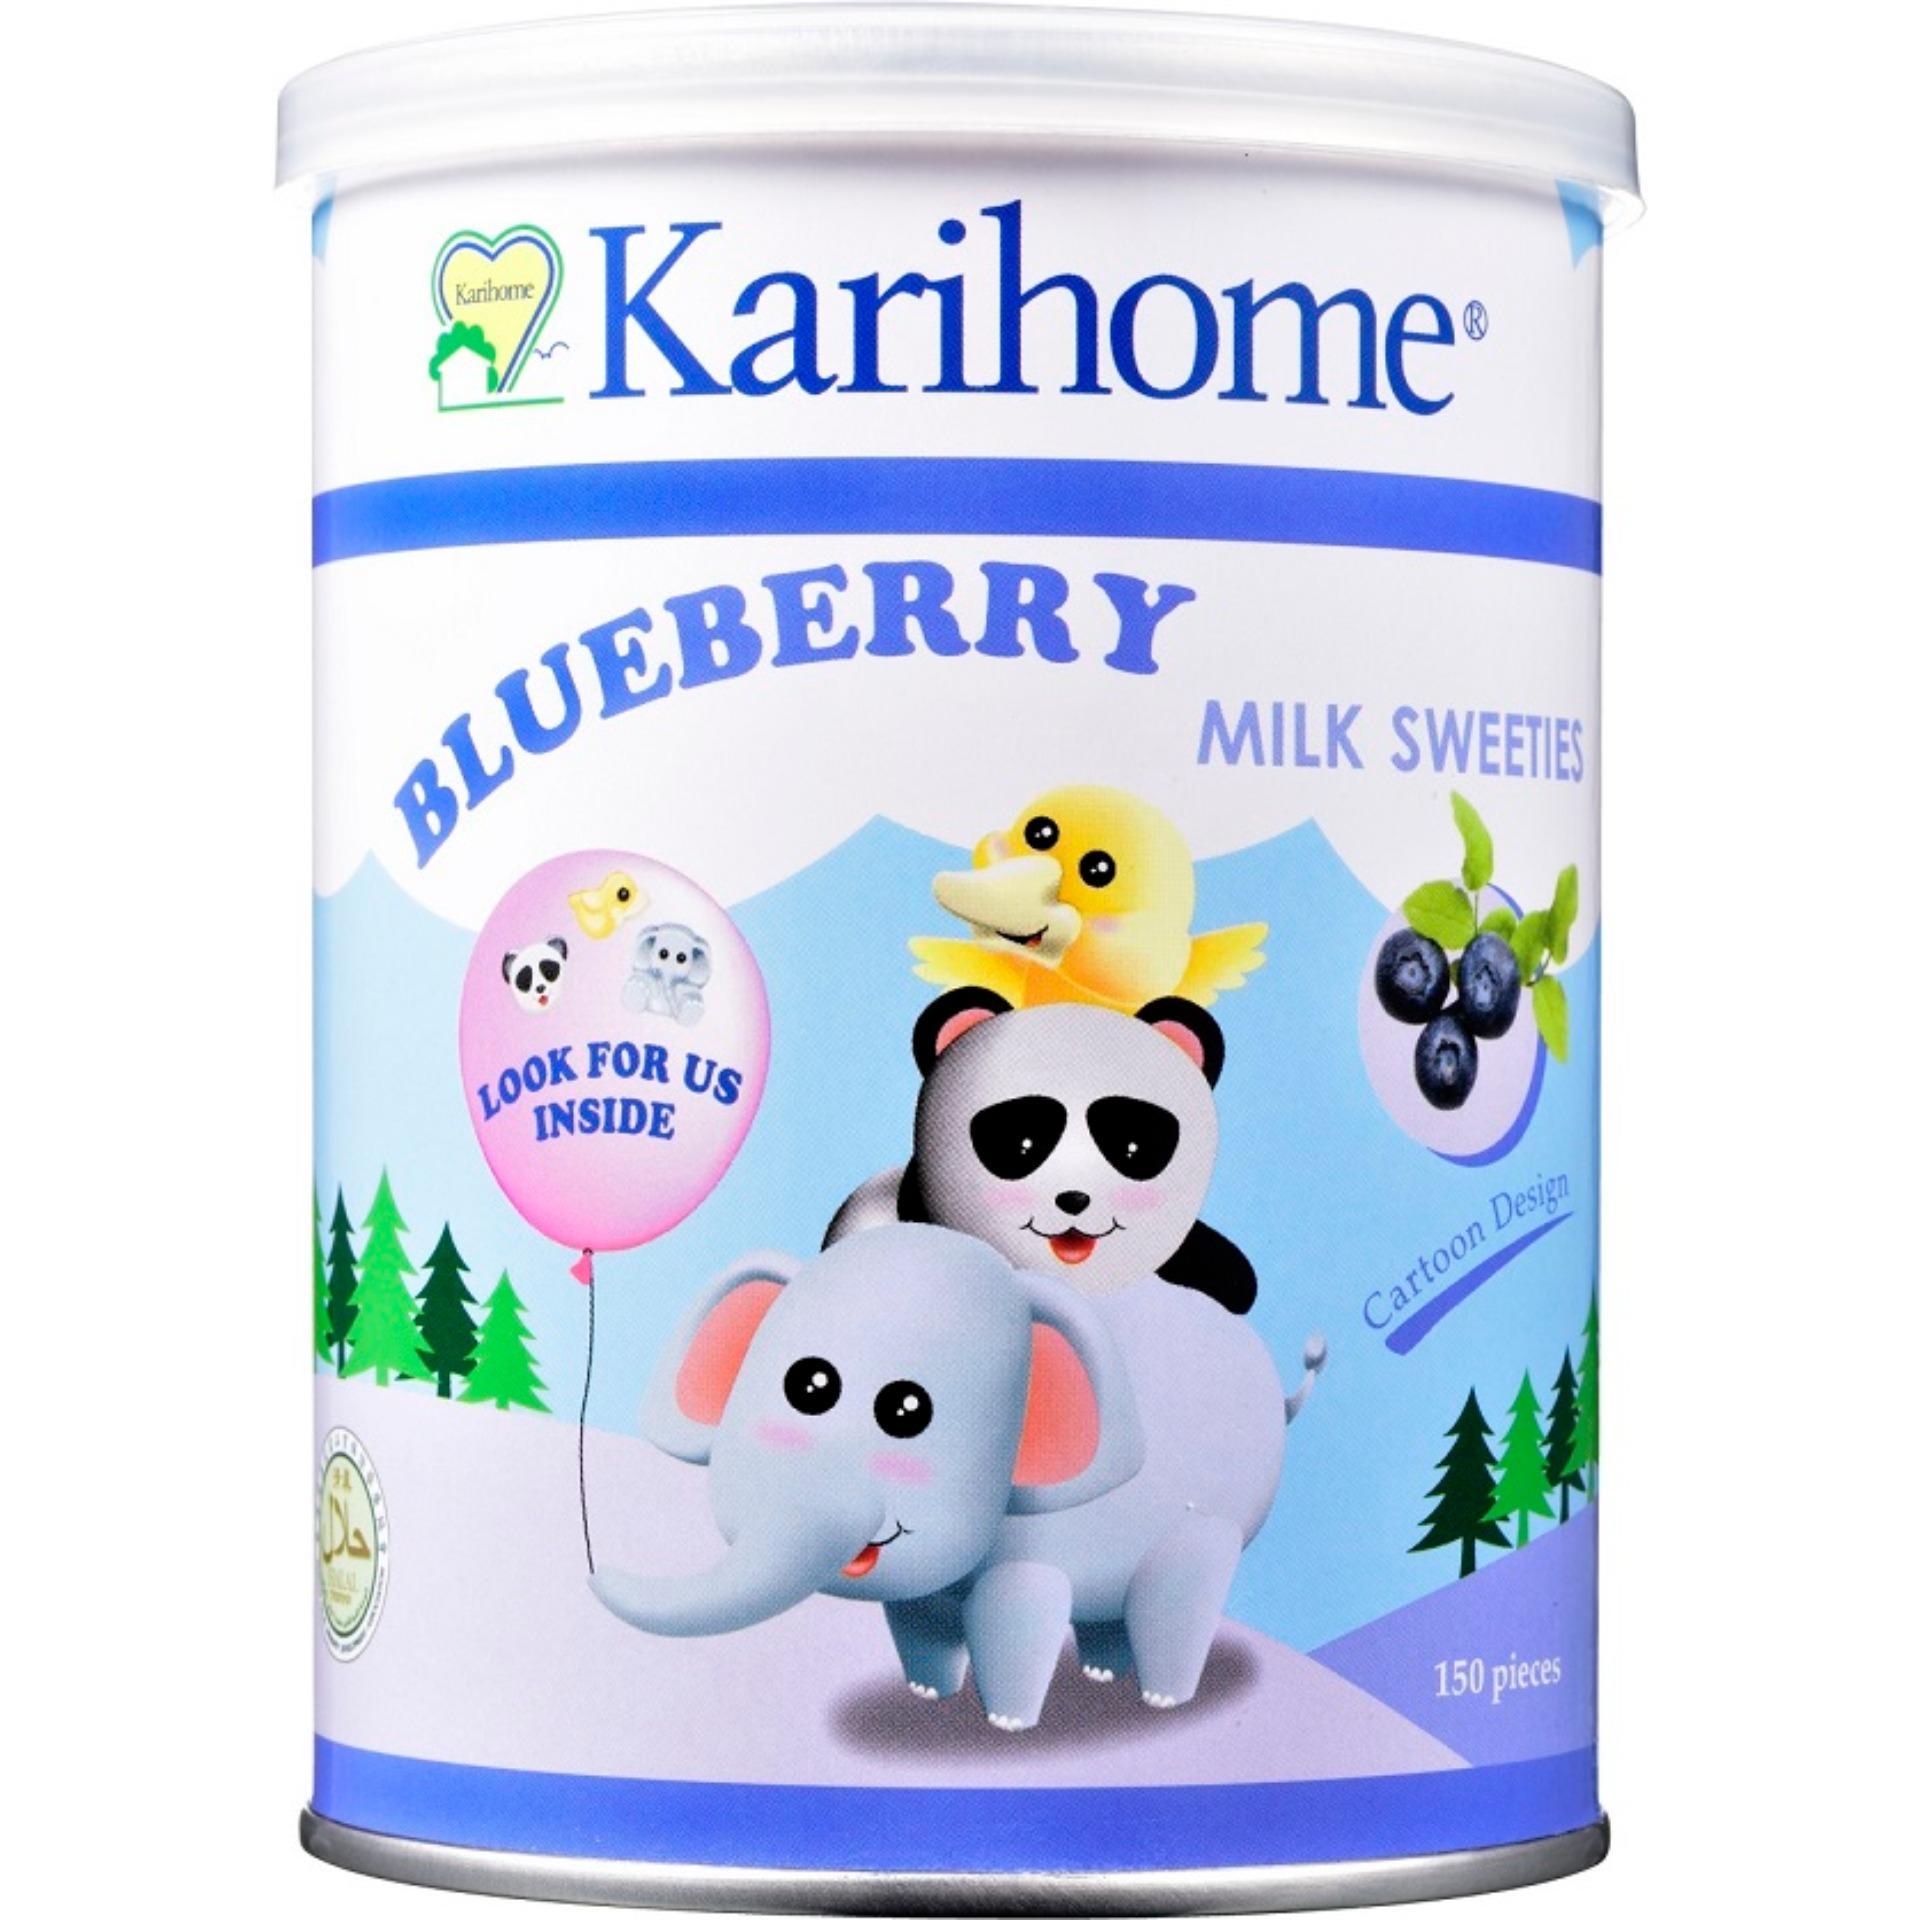 Karihome Sweeties - Blueberry By Lazada Retail Karihome Flagship Store.